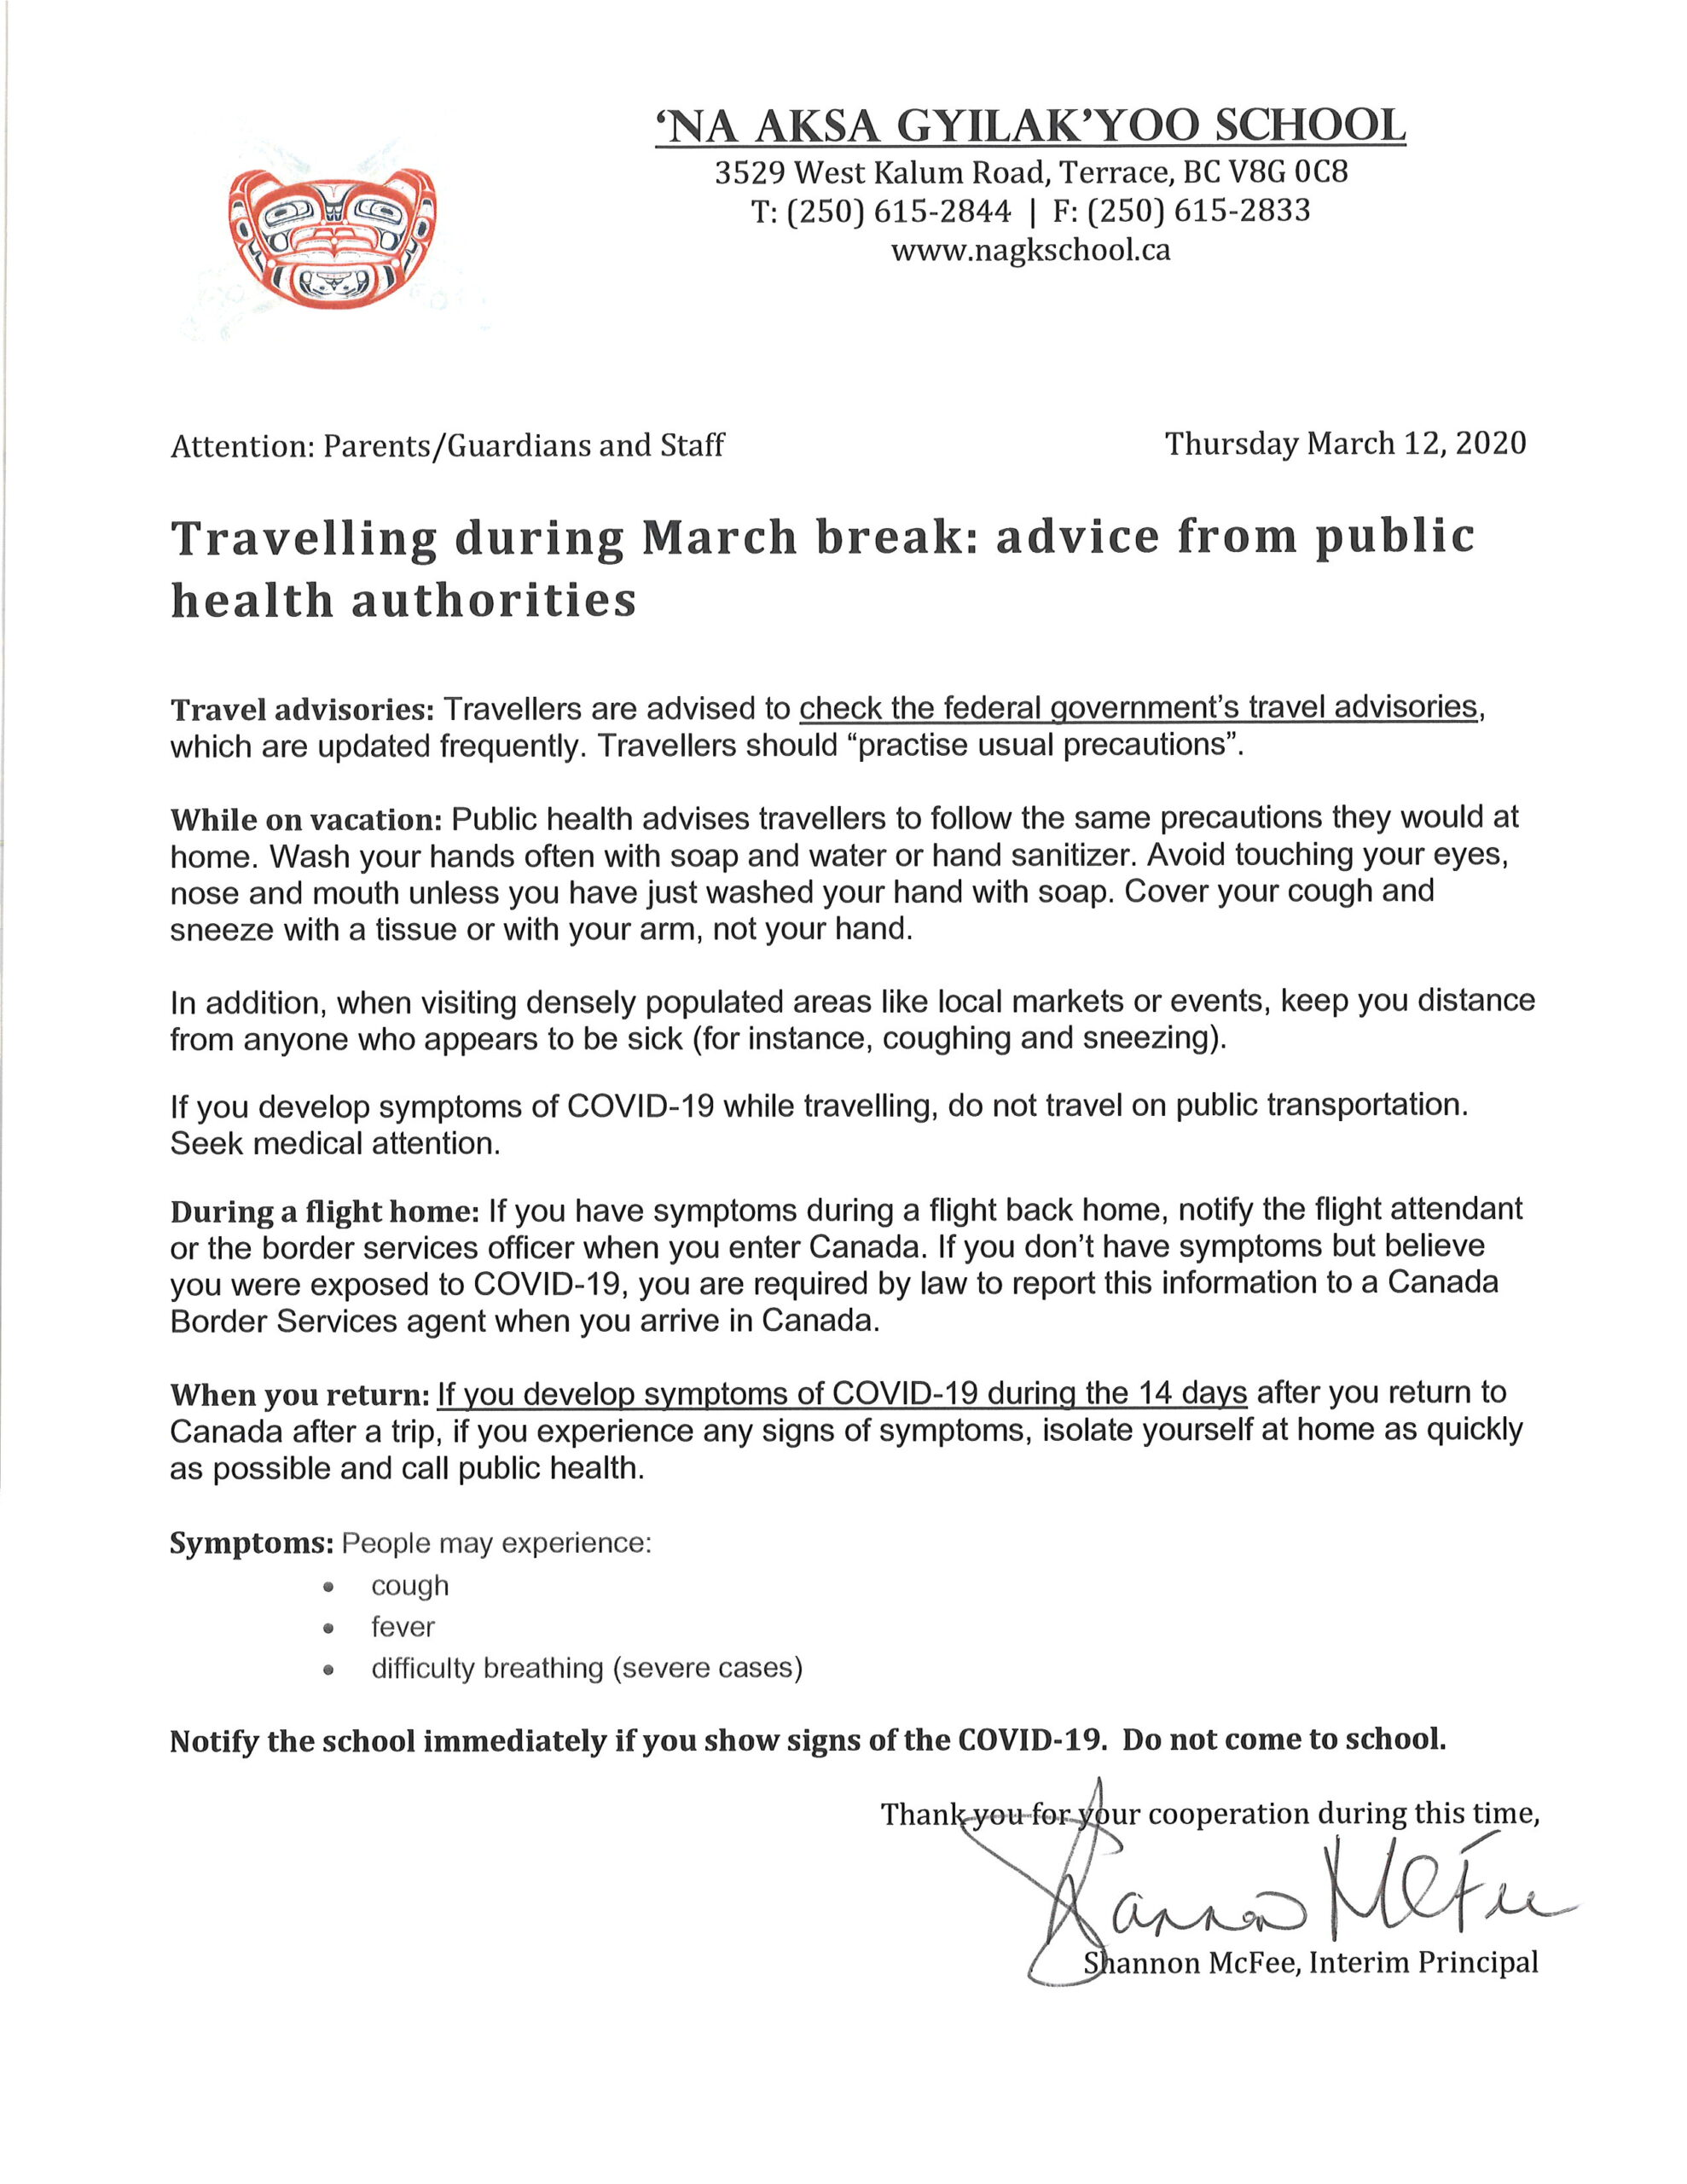 COVID-19 Notice March 12, 2020